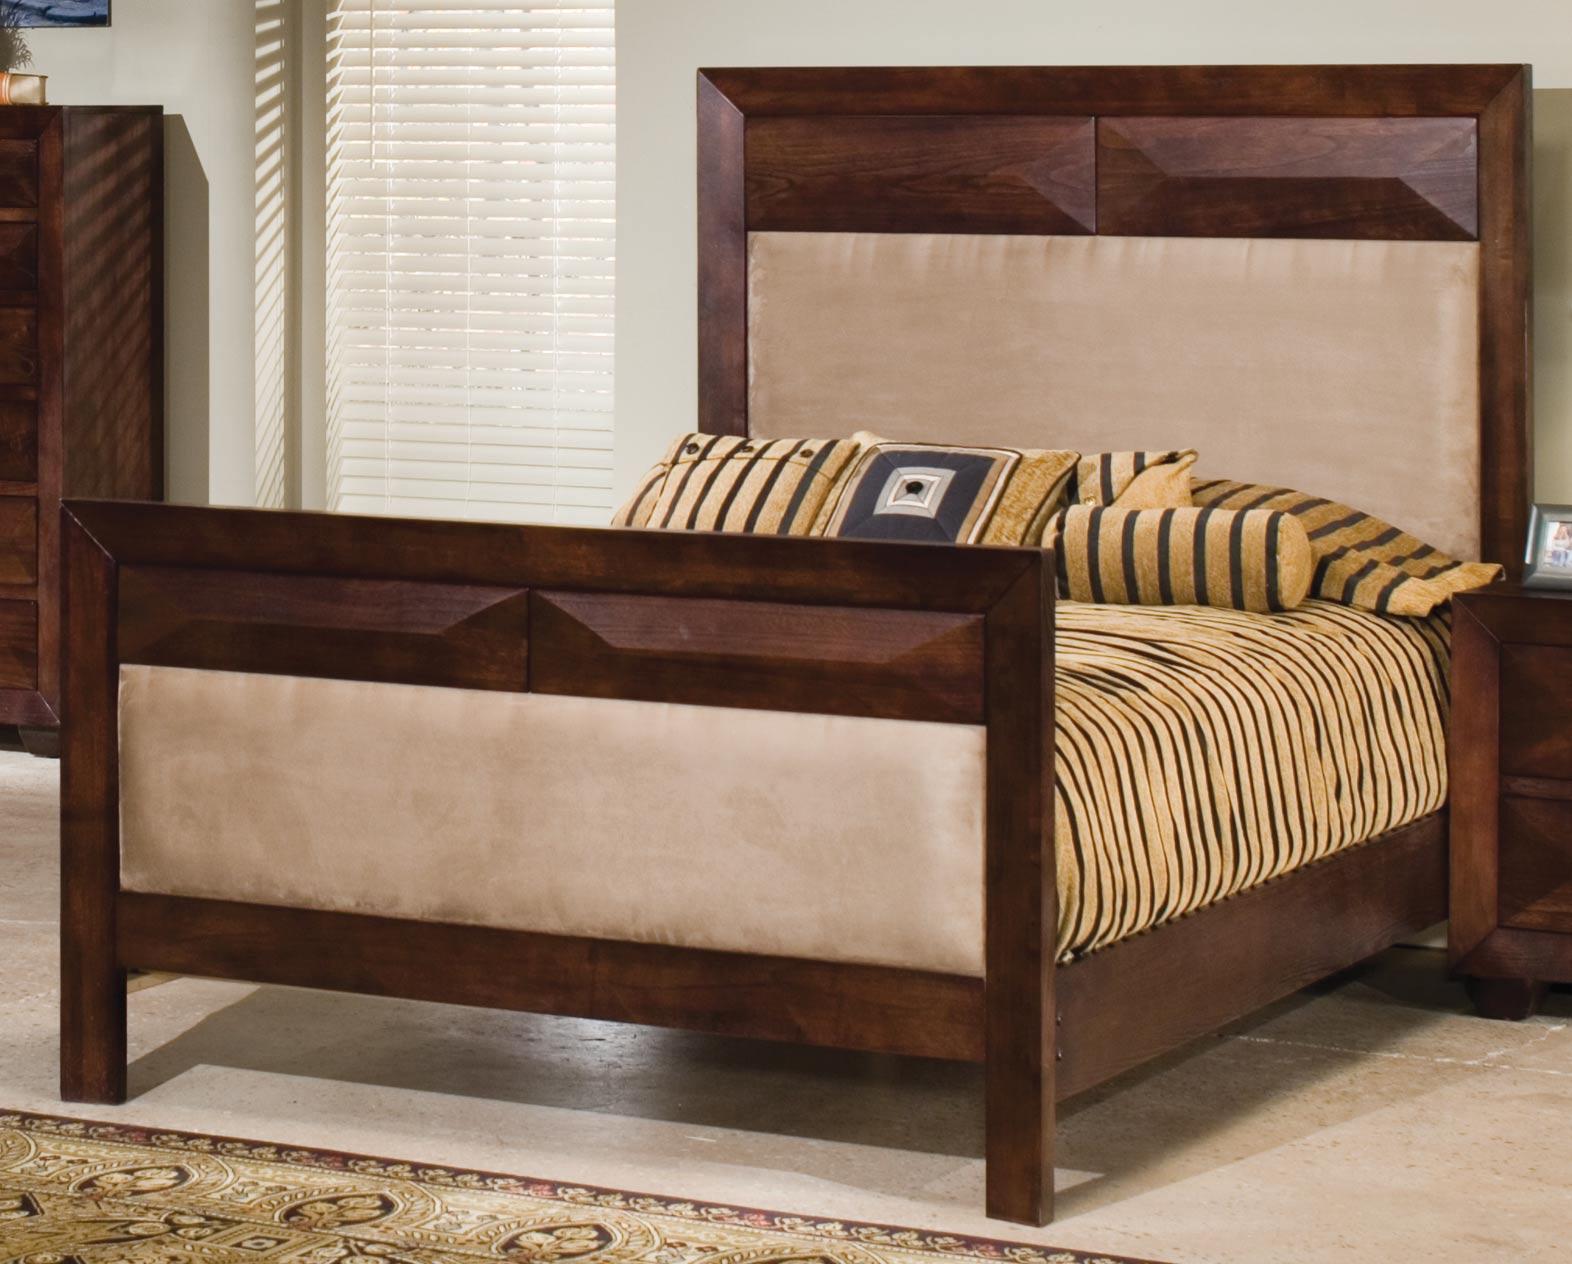 Homelegance King Tut Panel Bed Peat Microfiber